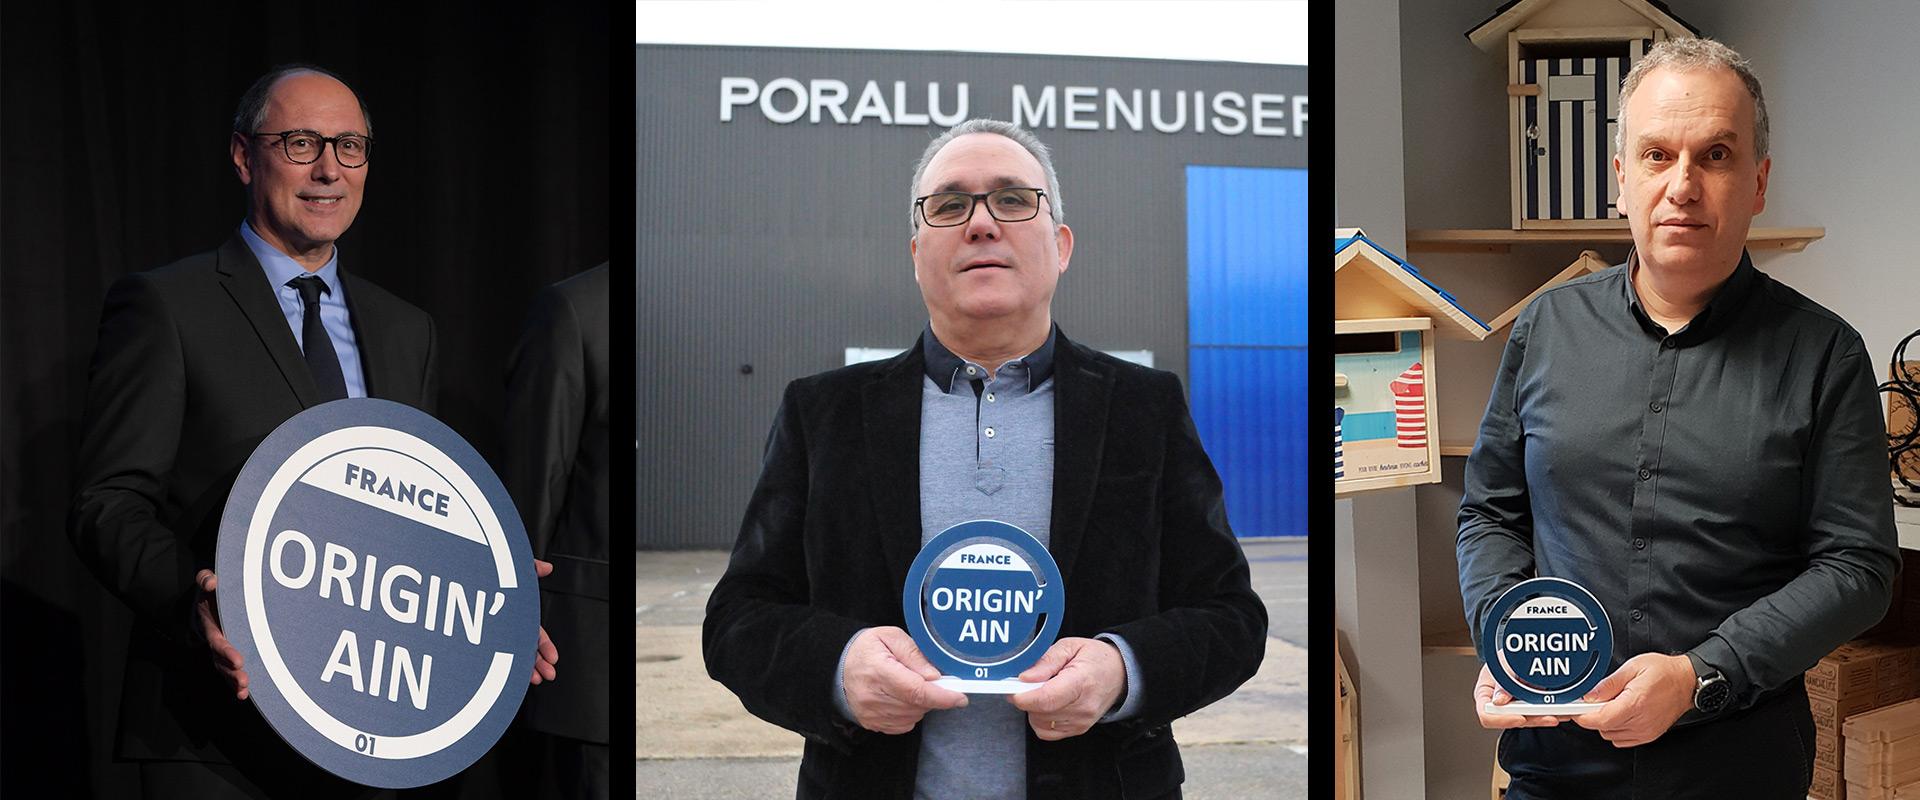 label des entreprises de l'ain 100% local - Manuel Inigo Poralu menuiseries - Hervé Guerry Creastuce Maillat